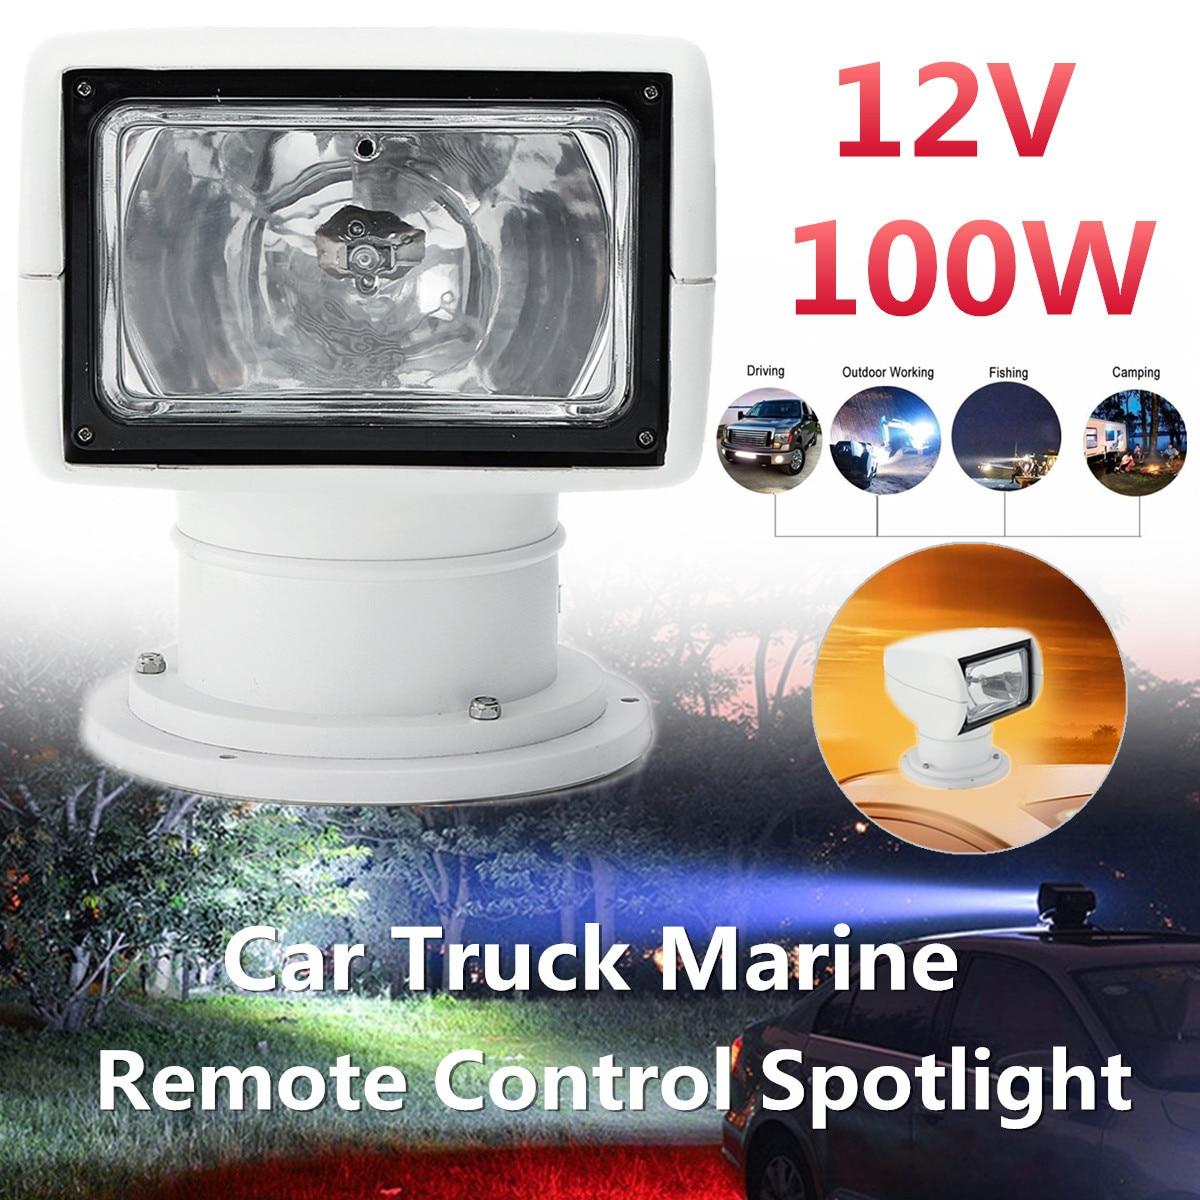 Boat Truck Car Spotlight 12V 100W 2500LM 3200K Marine Searchlight Light Bulb Remote Control PC+Aluminum Multi-angled White marine boat spotlight remote control searchlight truck car rv 24v 100w bulb